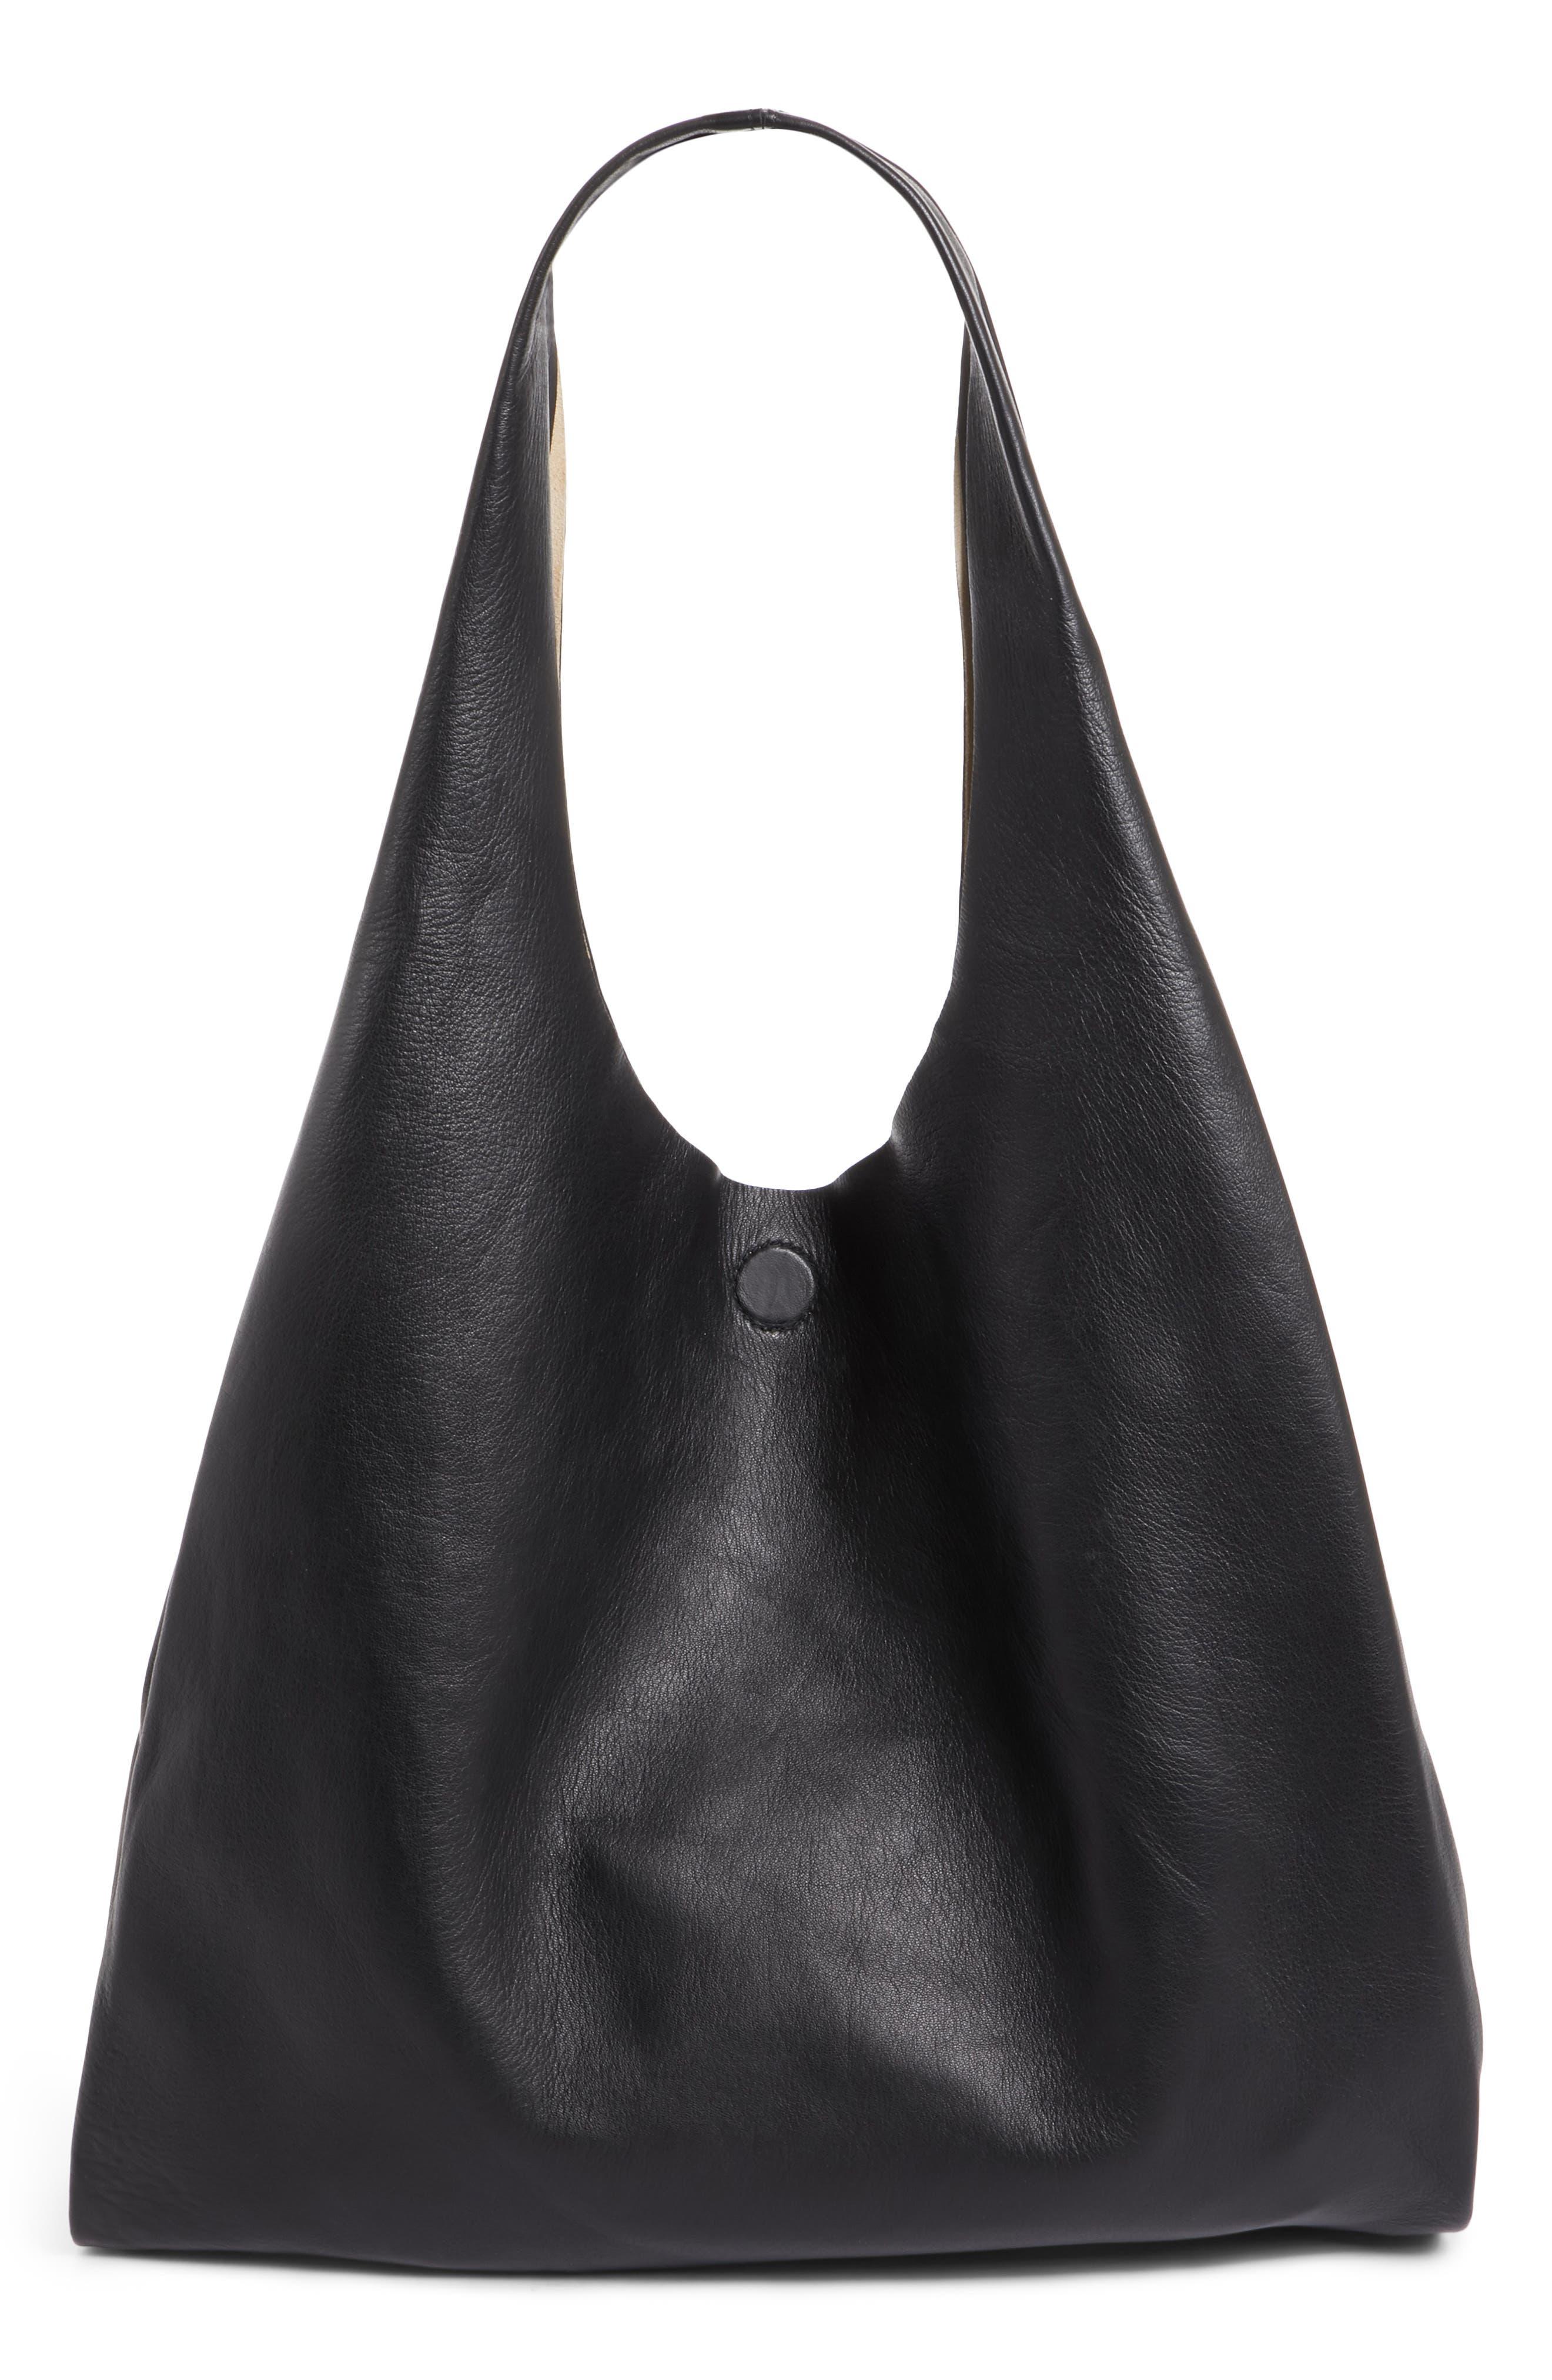 Maison Margiela Calfskin Leather Shopper